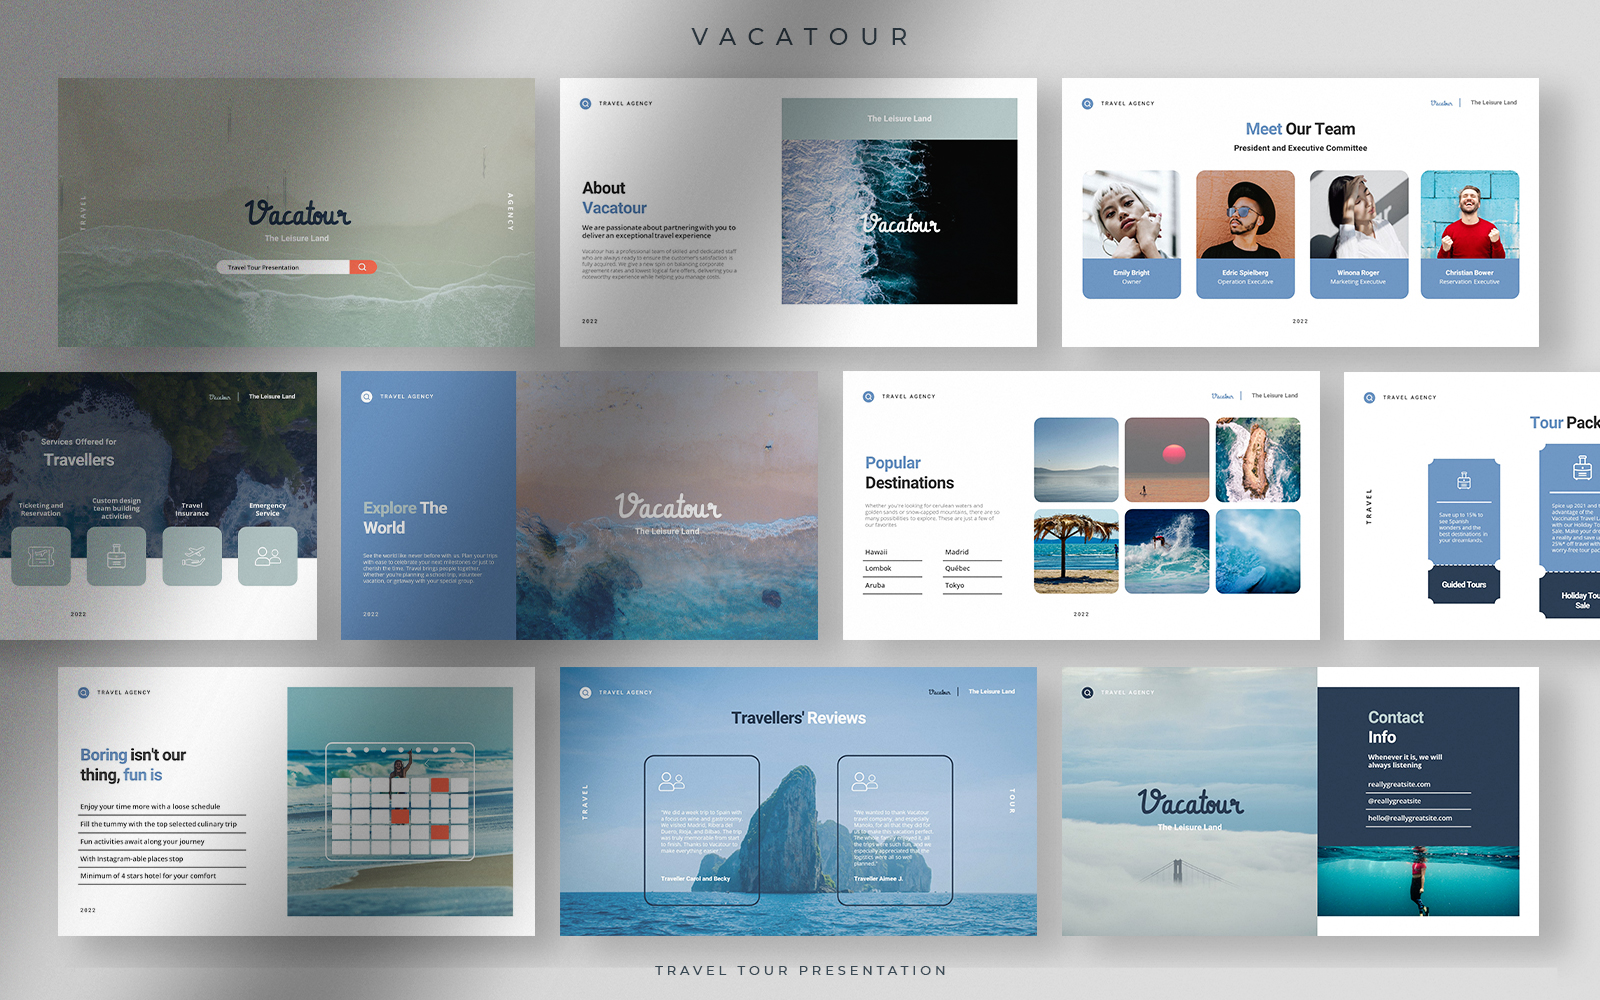 Vacatour - Modern Professional Travel Tour Presentation Template